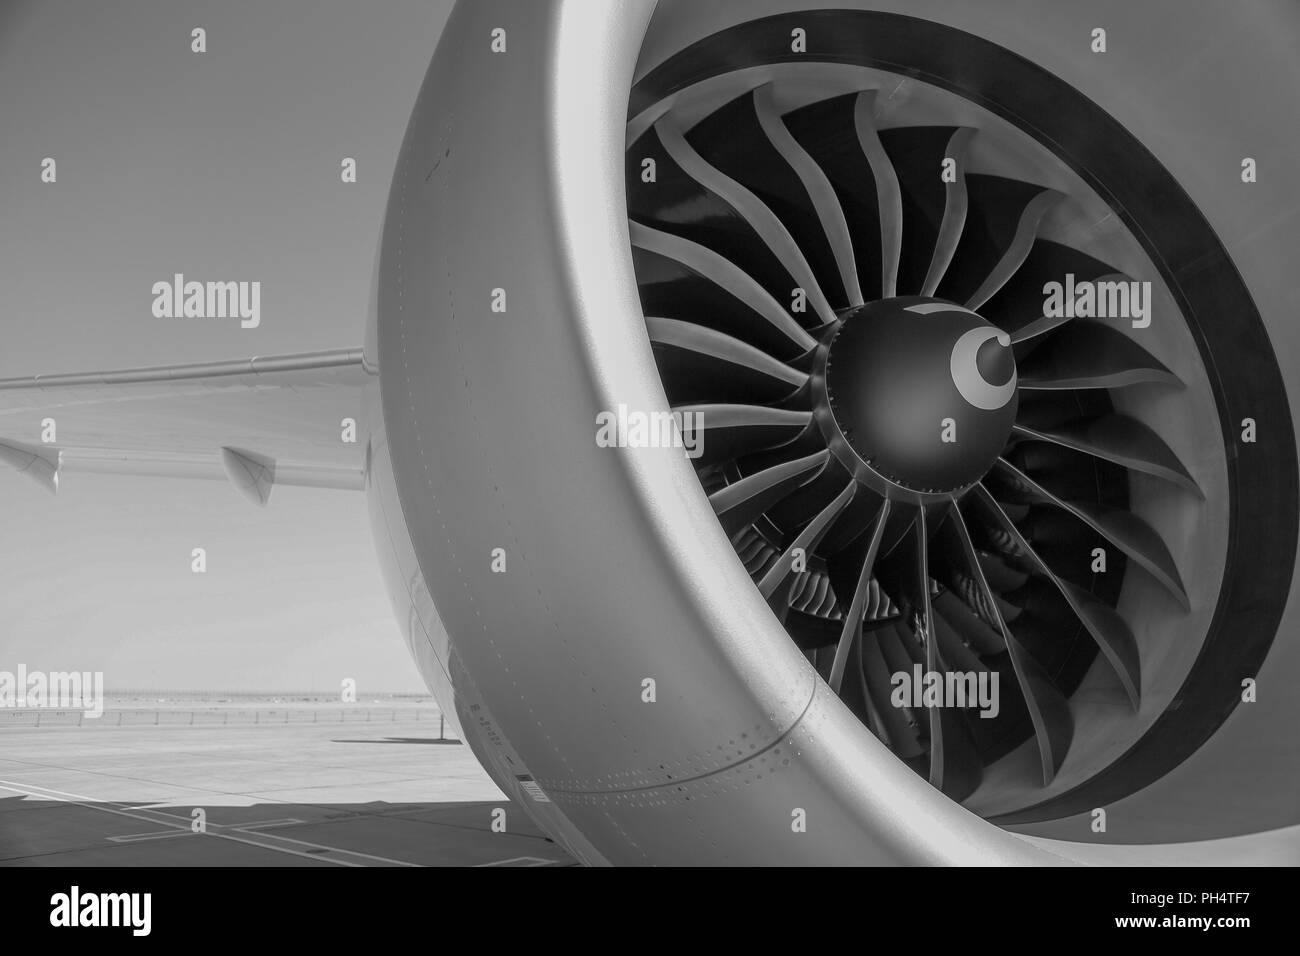 Aircraft Jet Engine - Stock Image